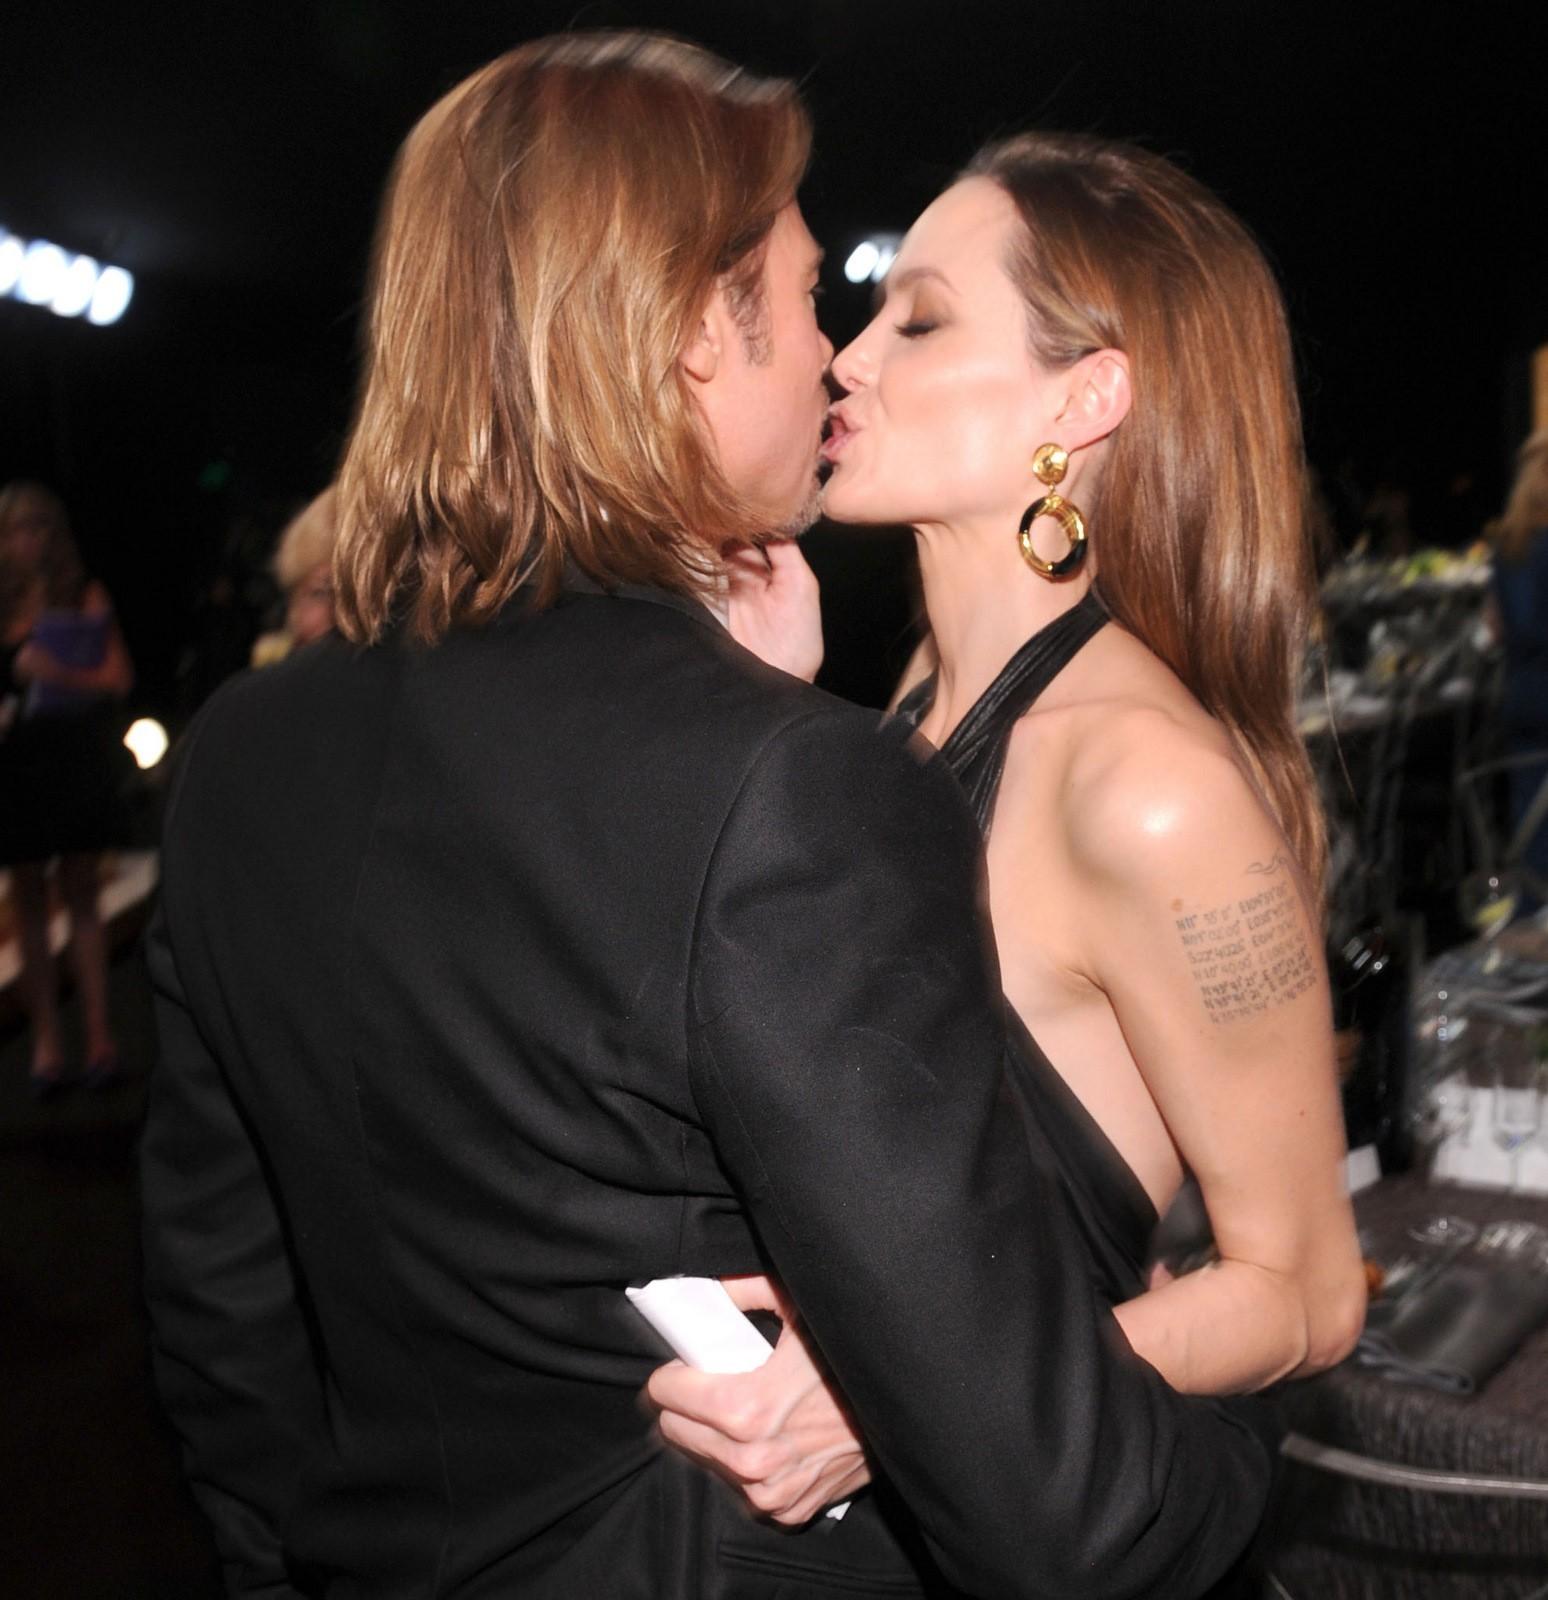 Brad Pitt Angelina Jolie PDA kiss Wonderwall gossip Kat Giantis